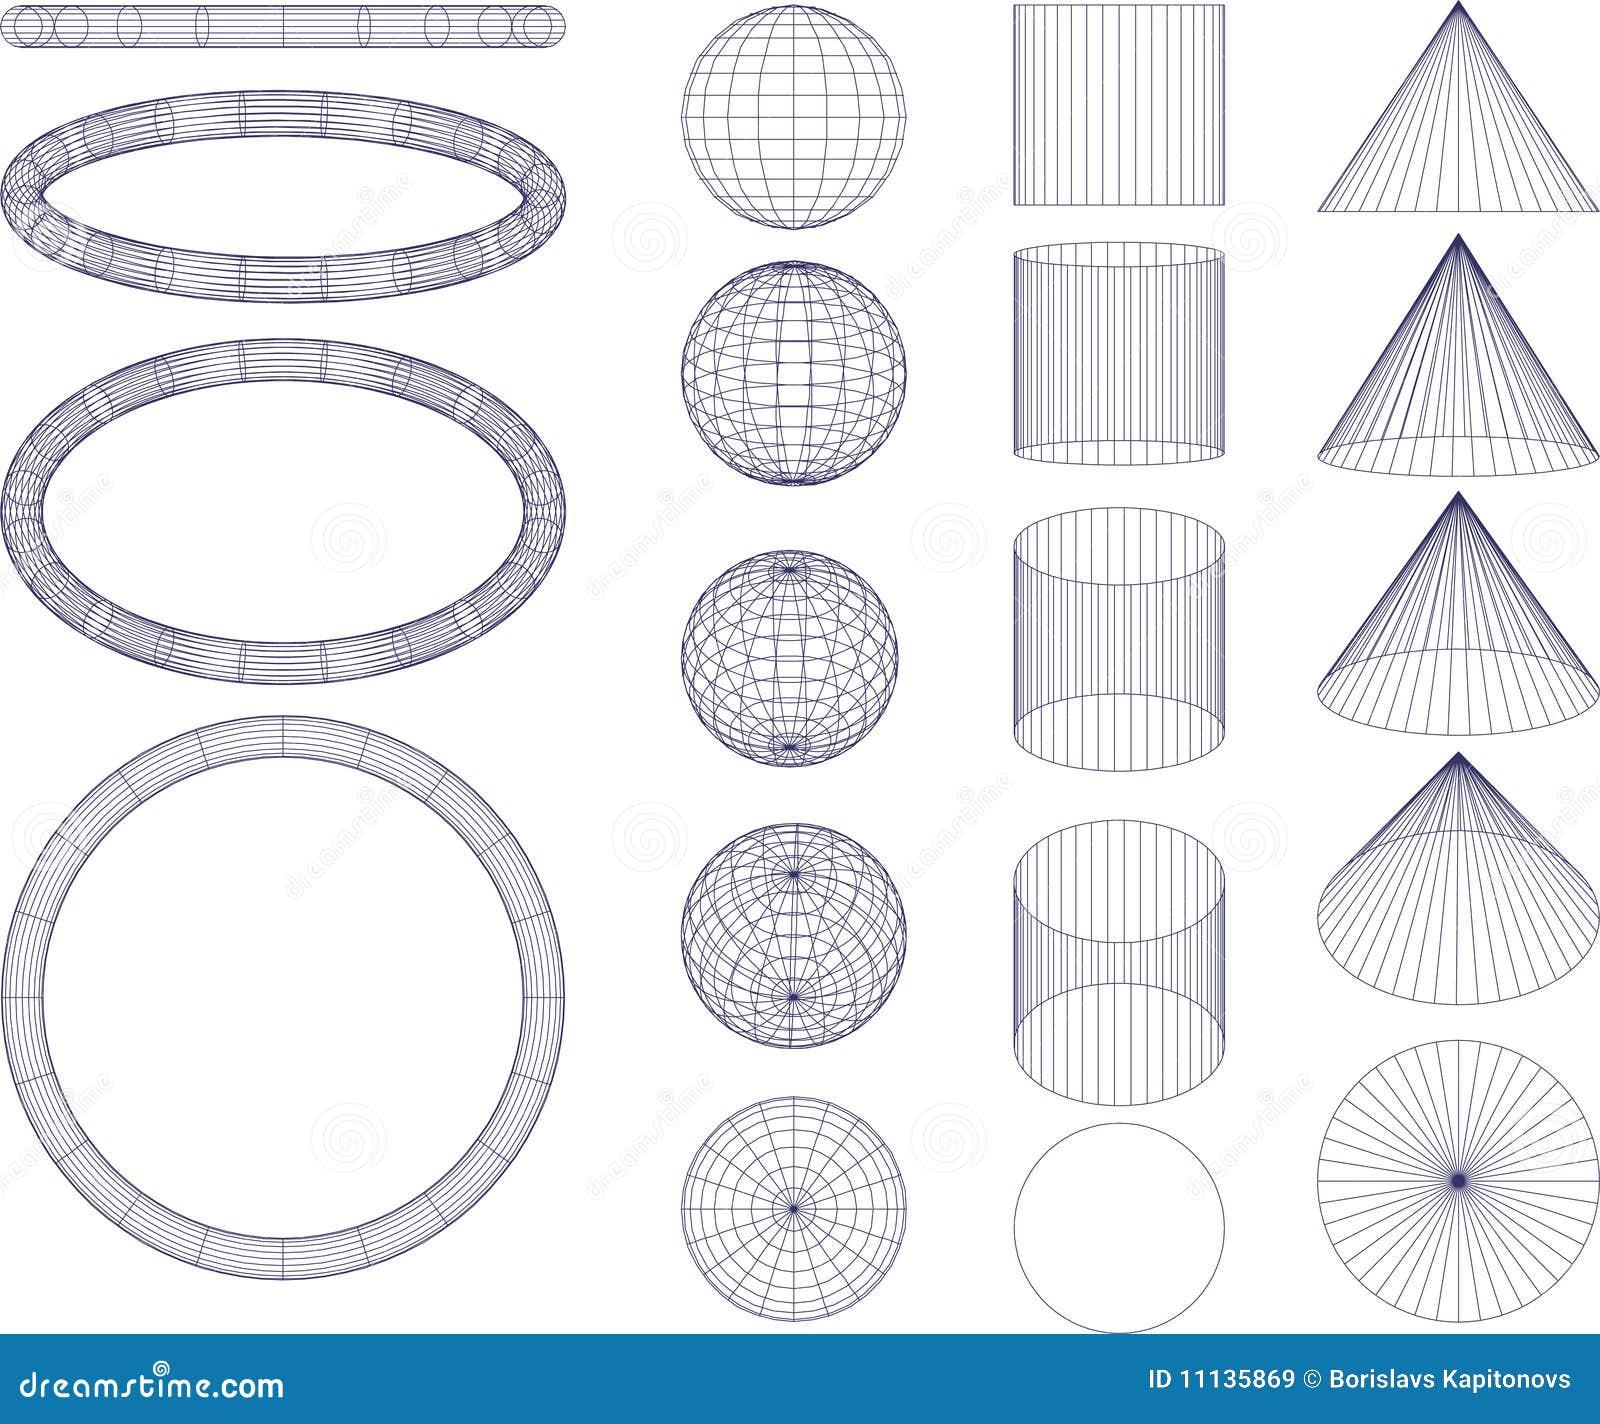 geometrische abbildungen lizenzfreie stockbilder bild 11135869. Black Bedroom Furniture Sets. Home Design Ideas